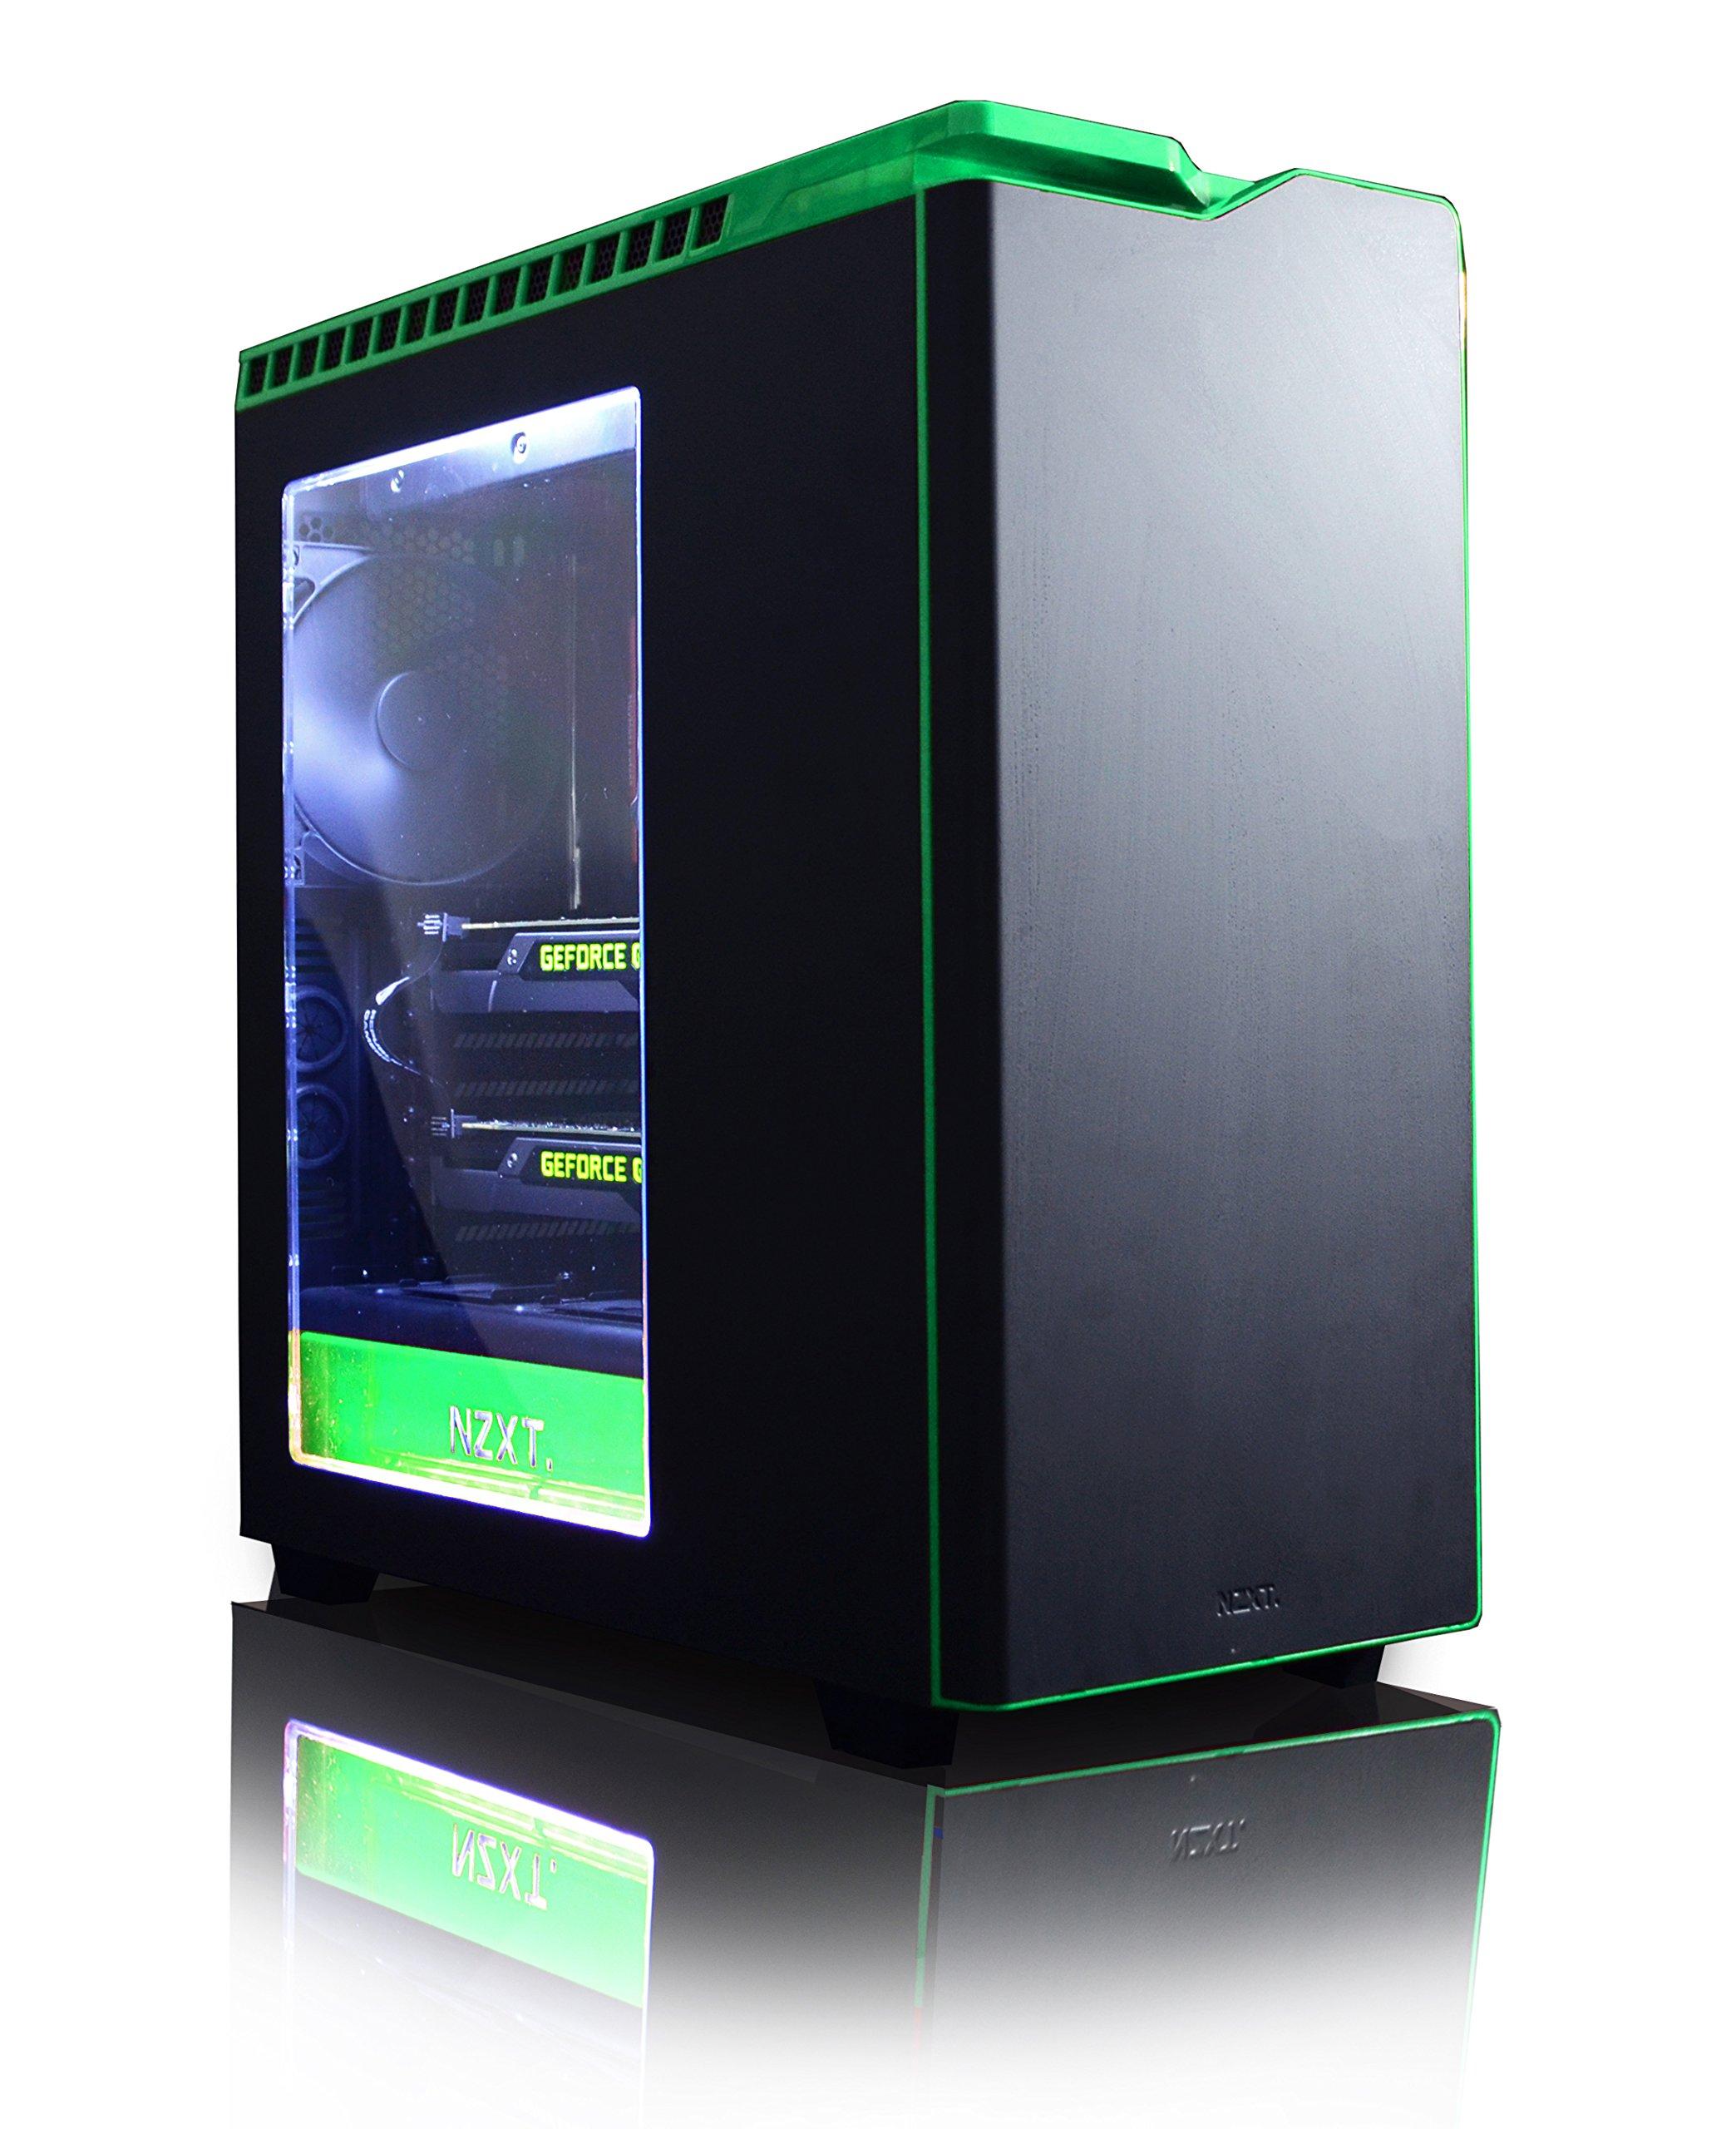 Vibox VBX-PC-5908 Legend Paket 32 68,6 cm (27 Zoll) Gaming Desktop-PC (Intel Core i7 5960X, 32GB RAM, 3240GB HDD, NVIDIA…